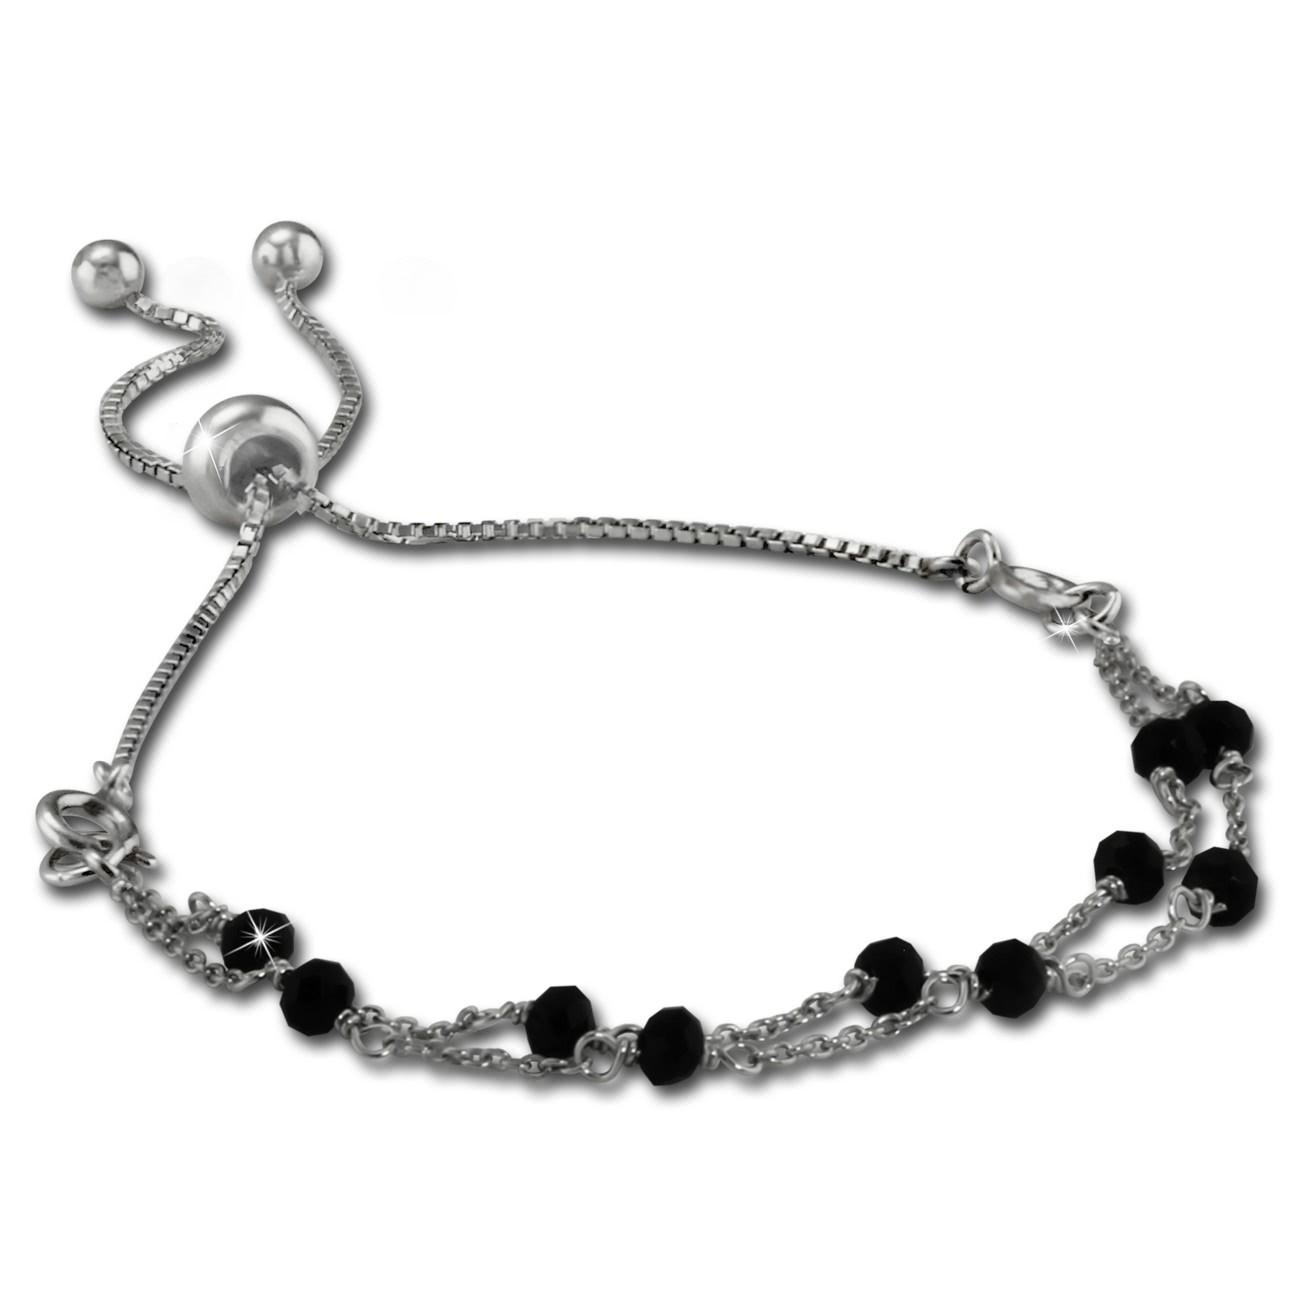 Armäleon Damenarmband Komplettset Kugeln schwarz Design+Verschluss 925er ARS012S